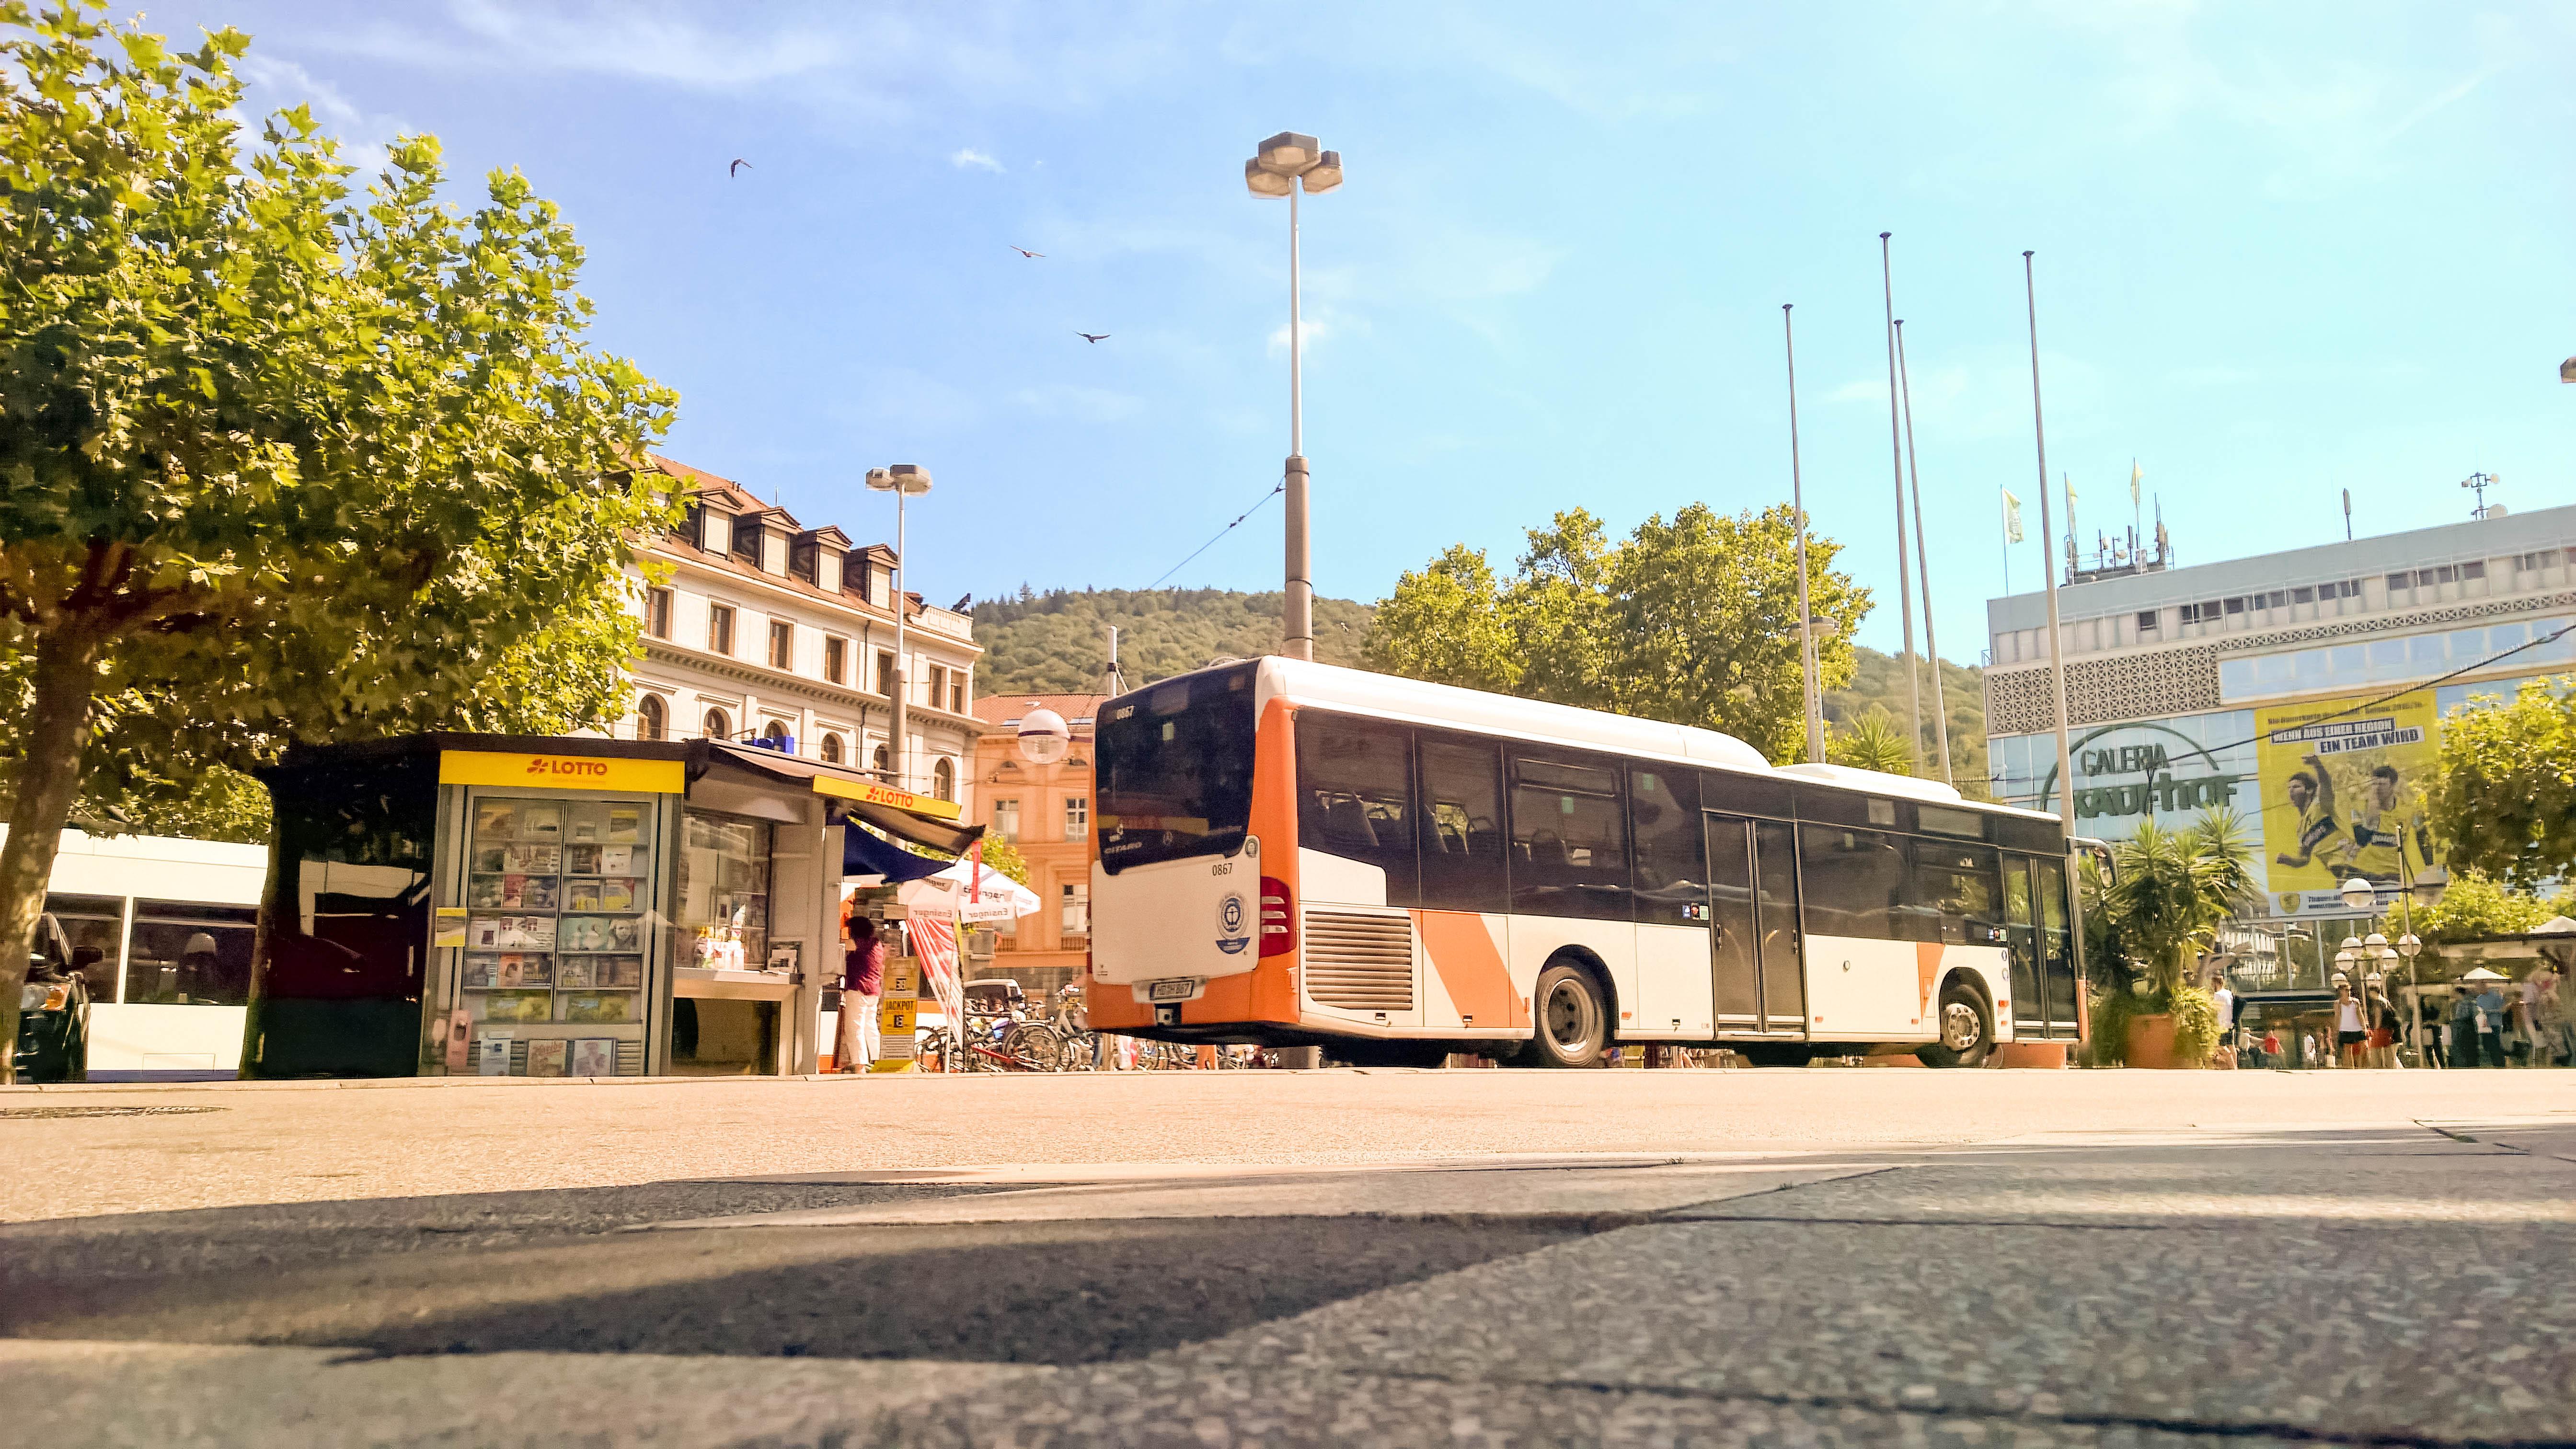 Nokia Lumia 1520 Photo Example - Bismarckplatz Heidelberg